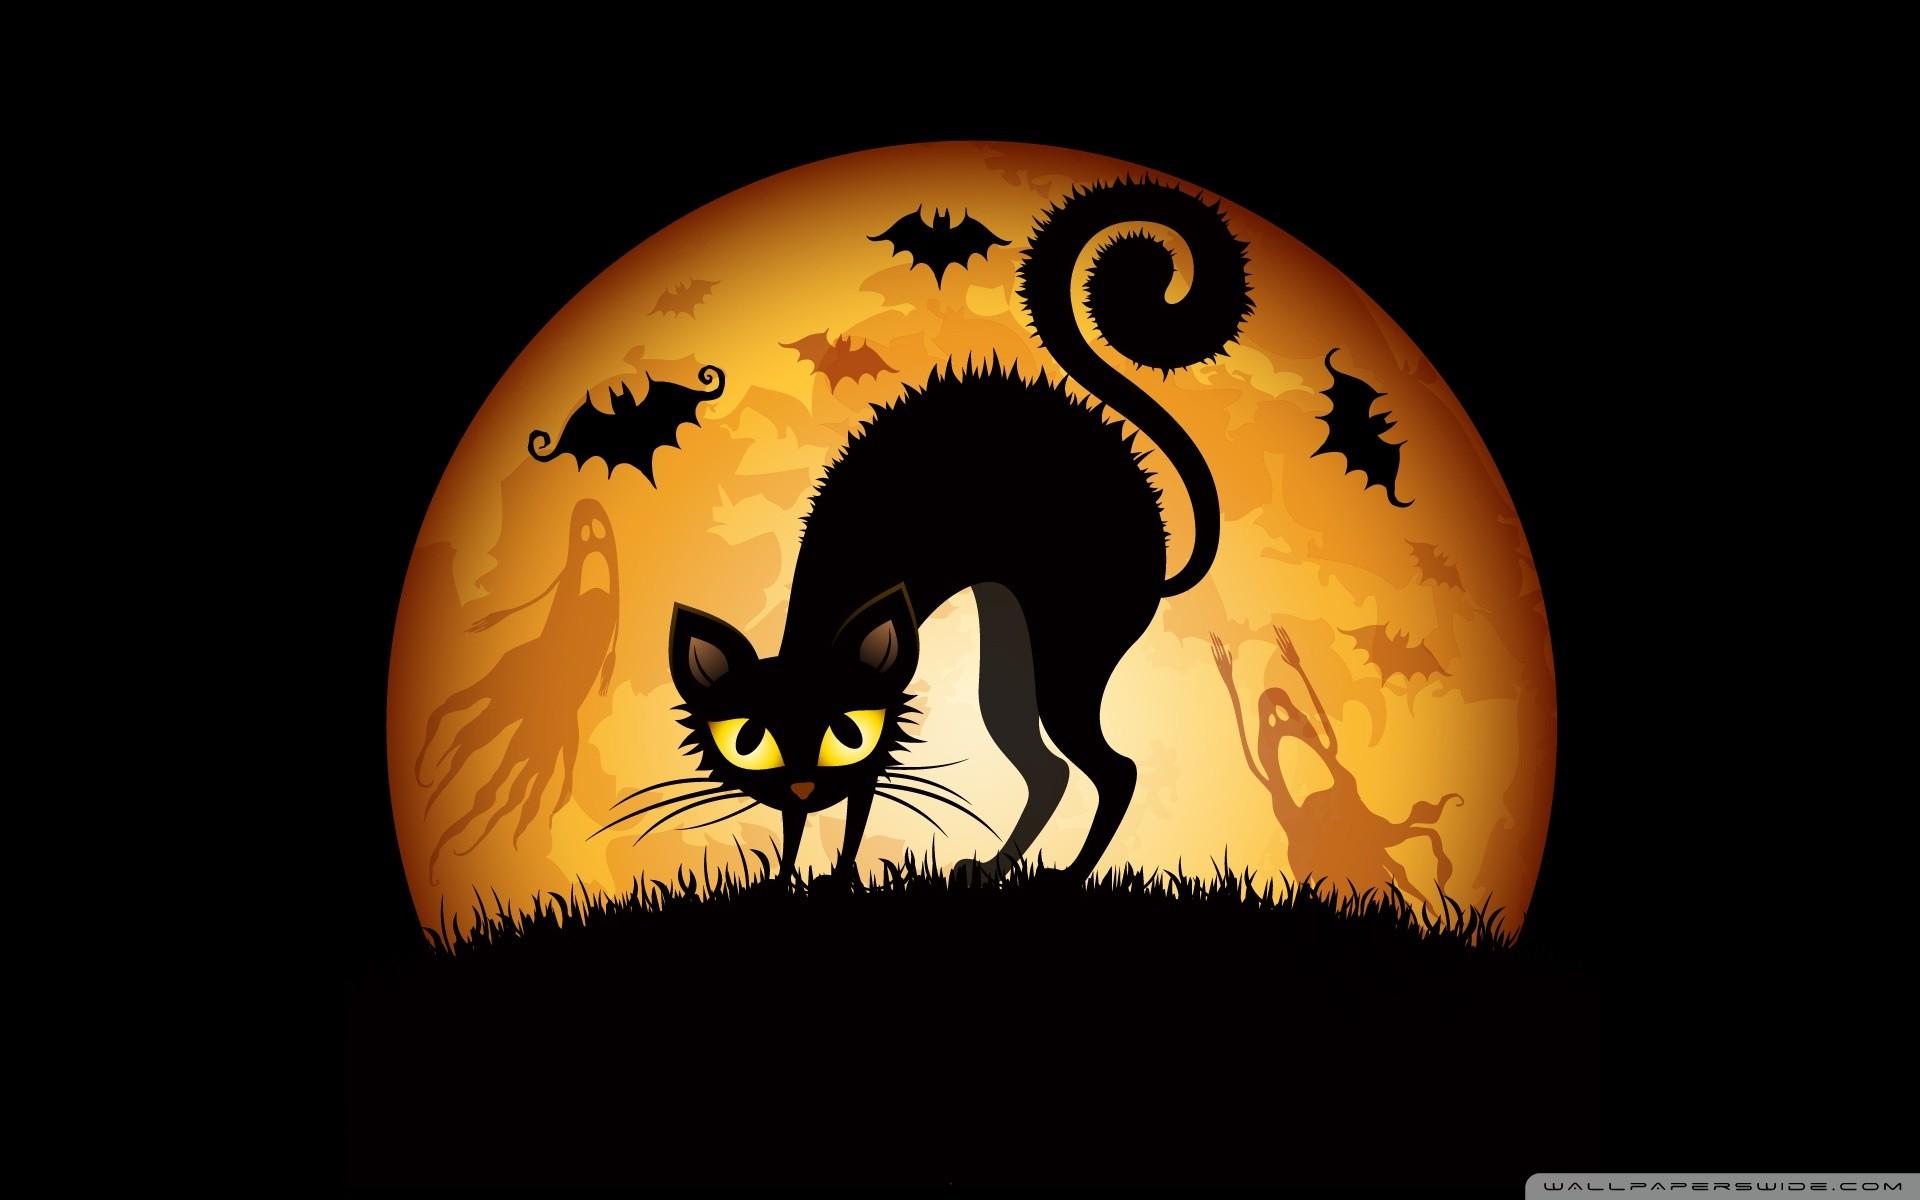 Must see Wallpaper Halloween Kitten - 492962-halloween-cat-wallpaper-1920x1200-photo  Pic_757118.jpg